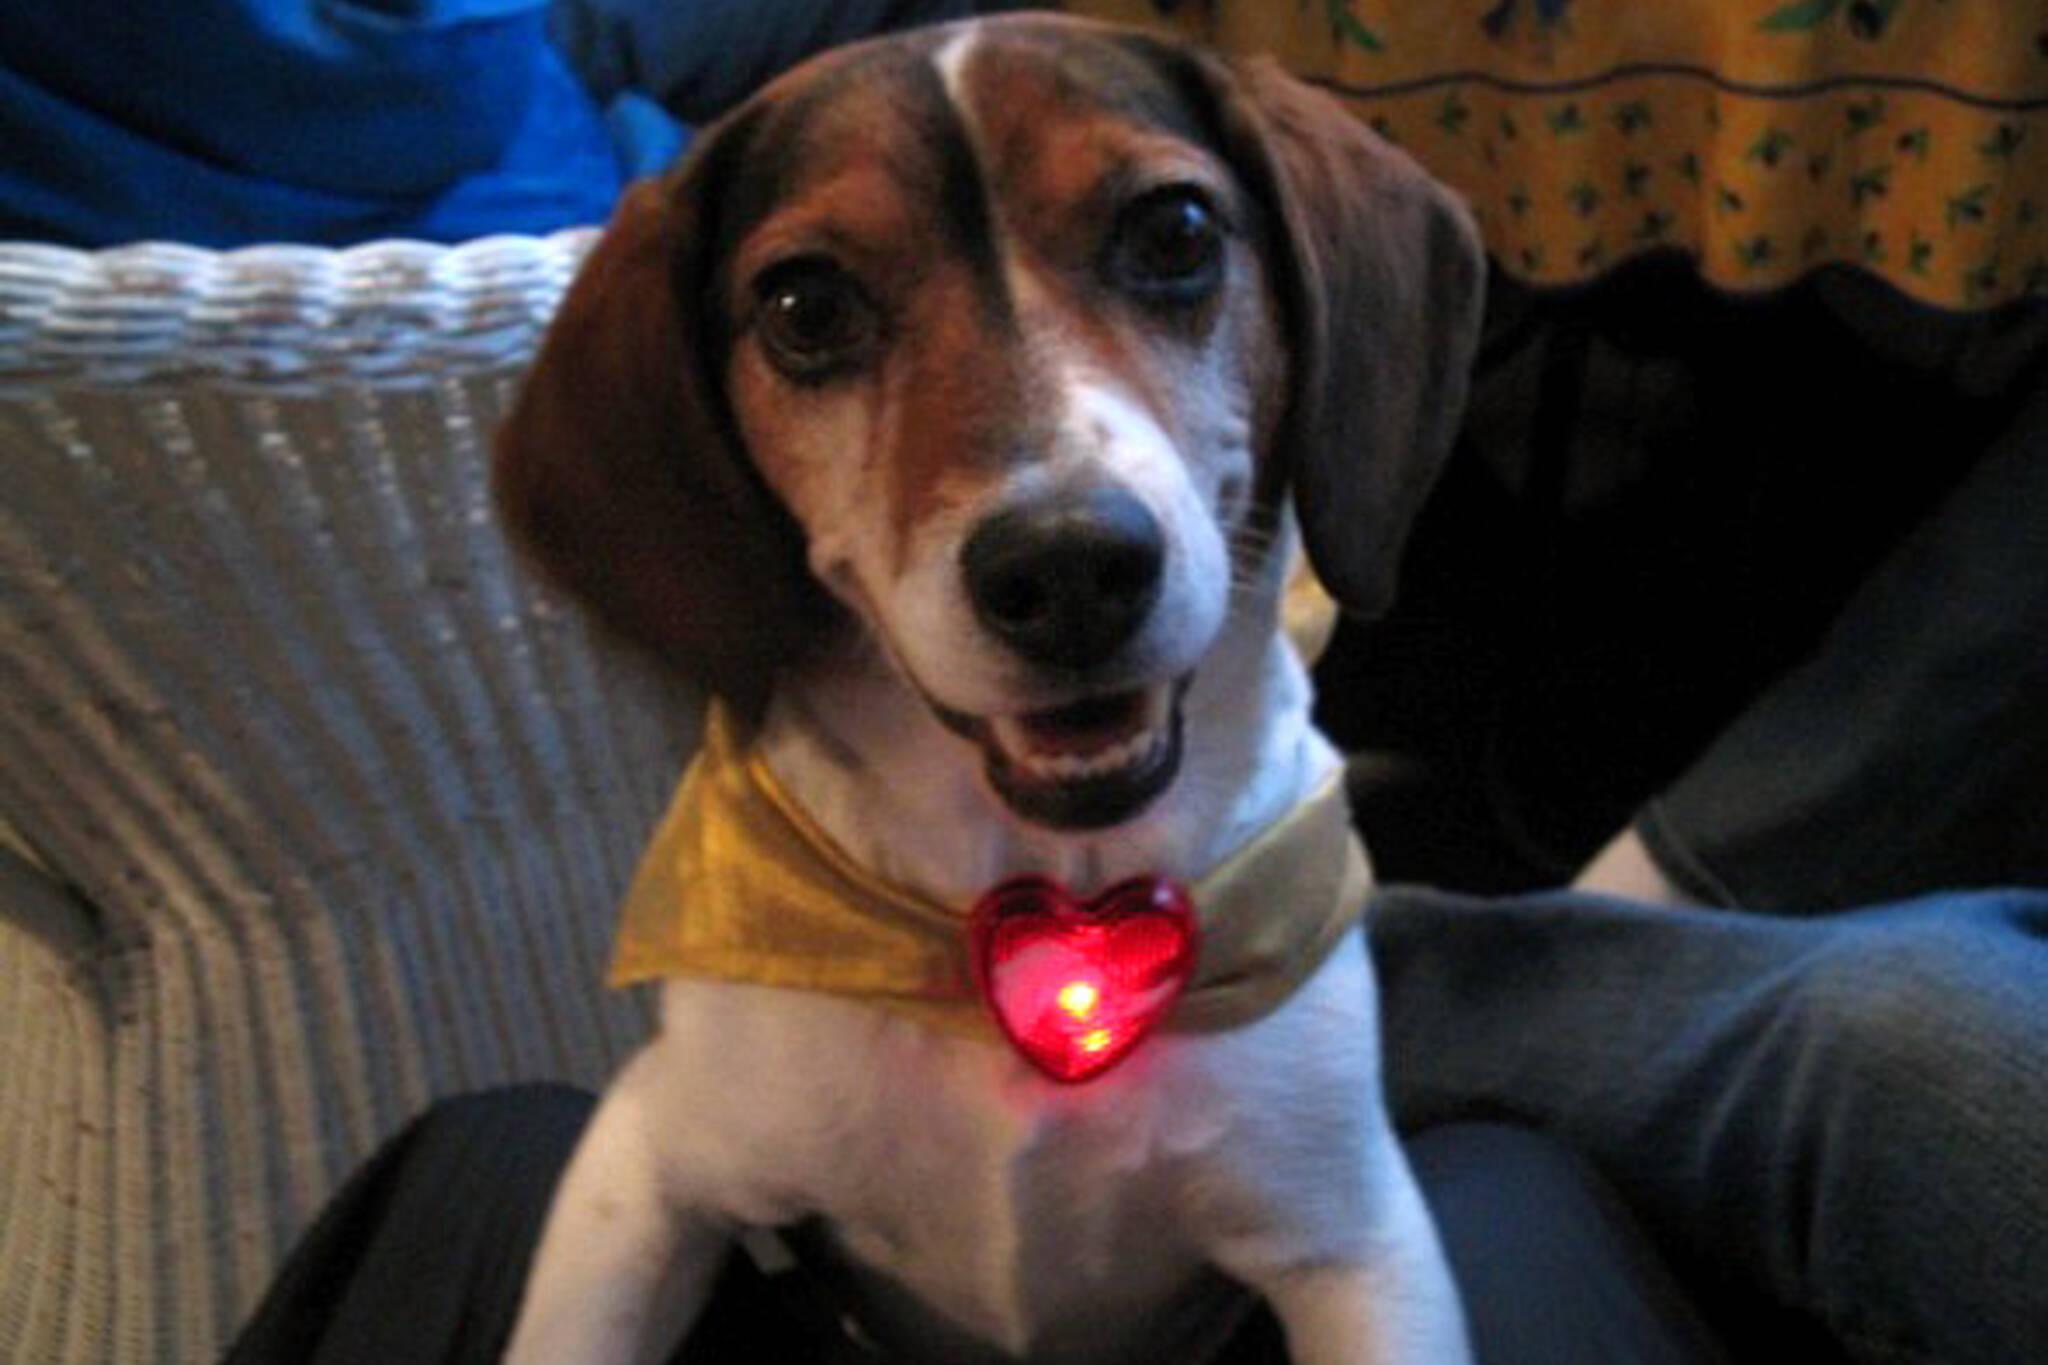 Bennie the dog enjoying Christmas